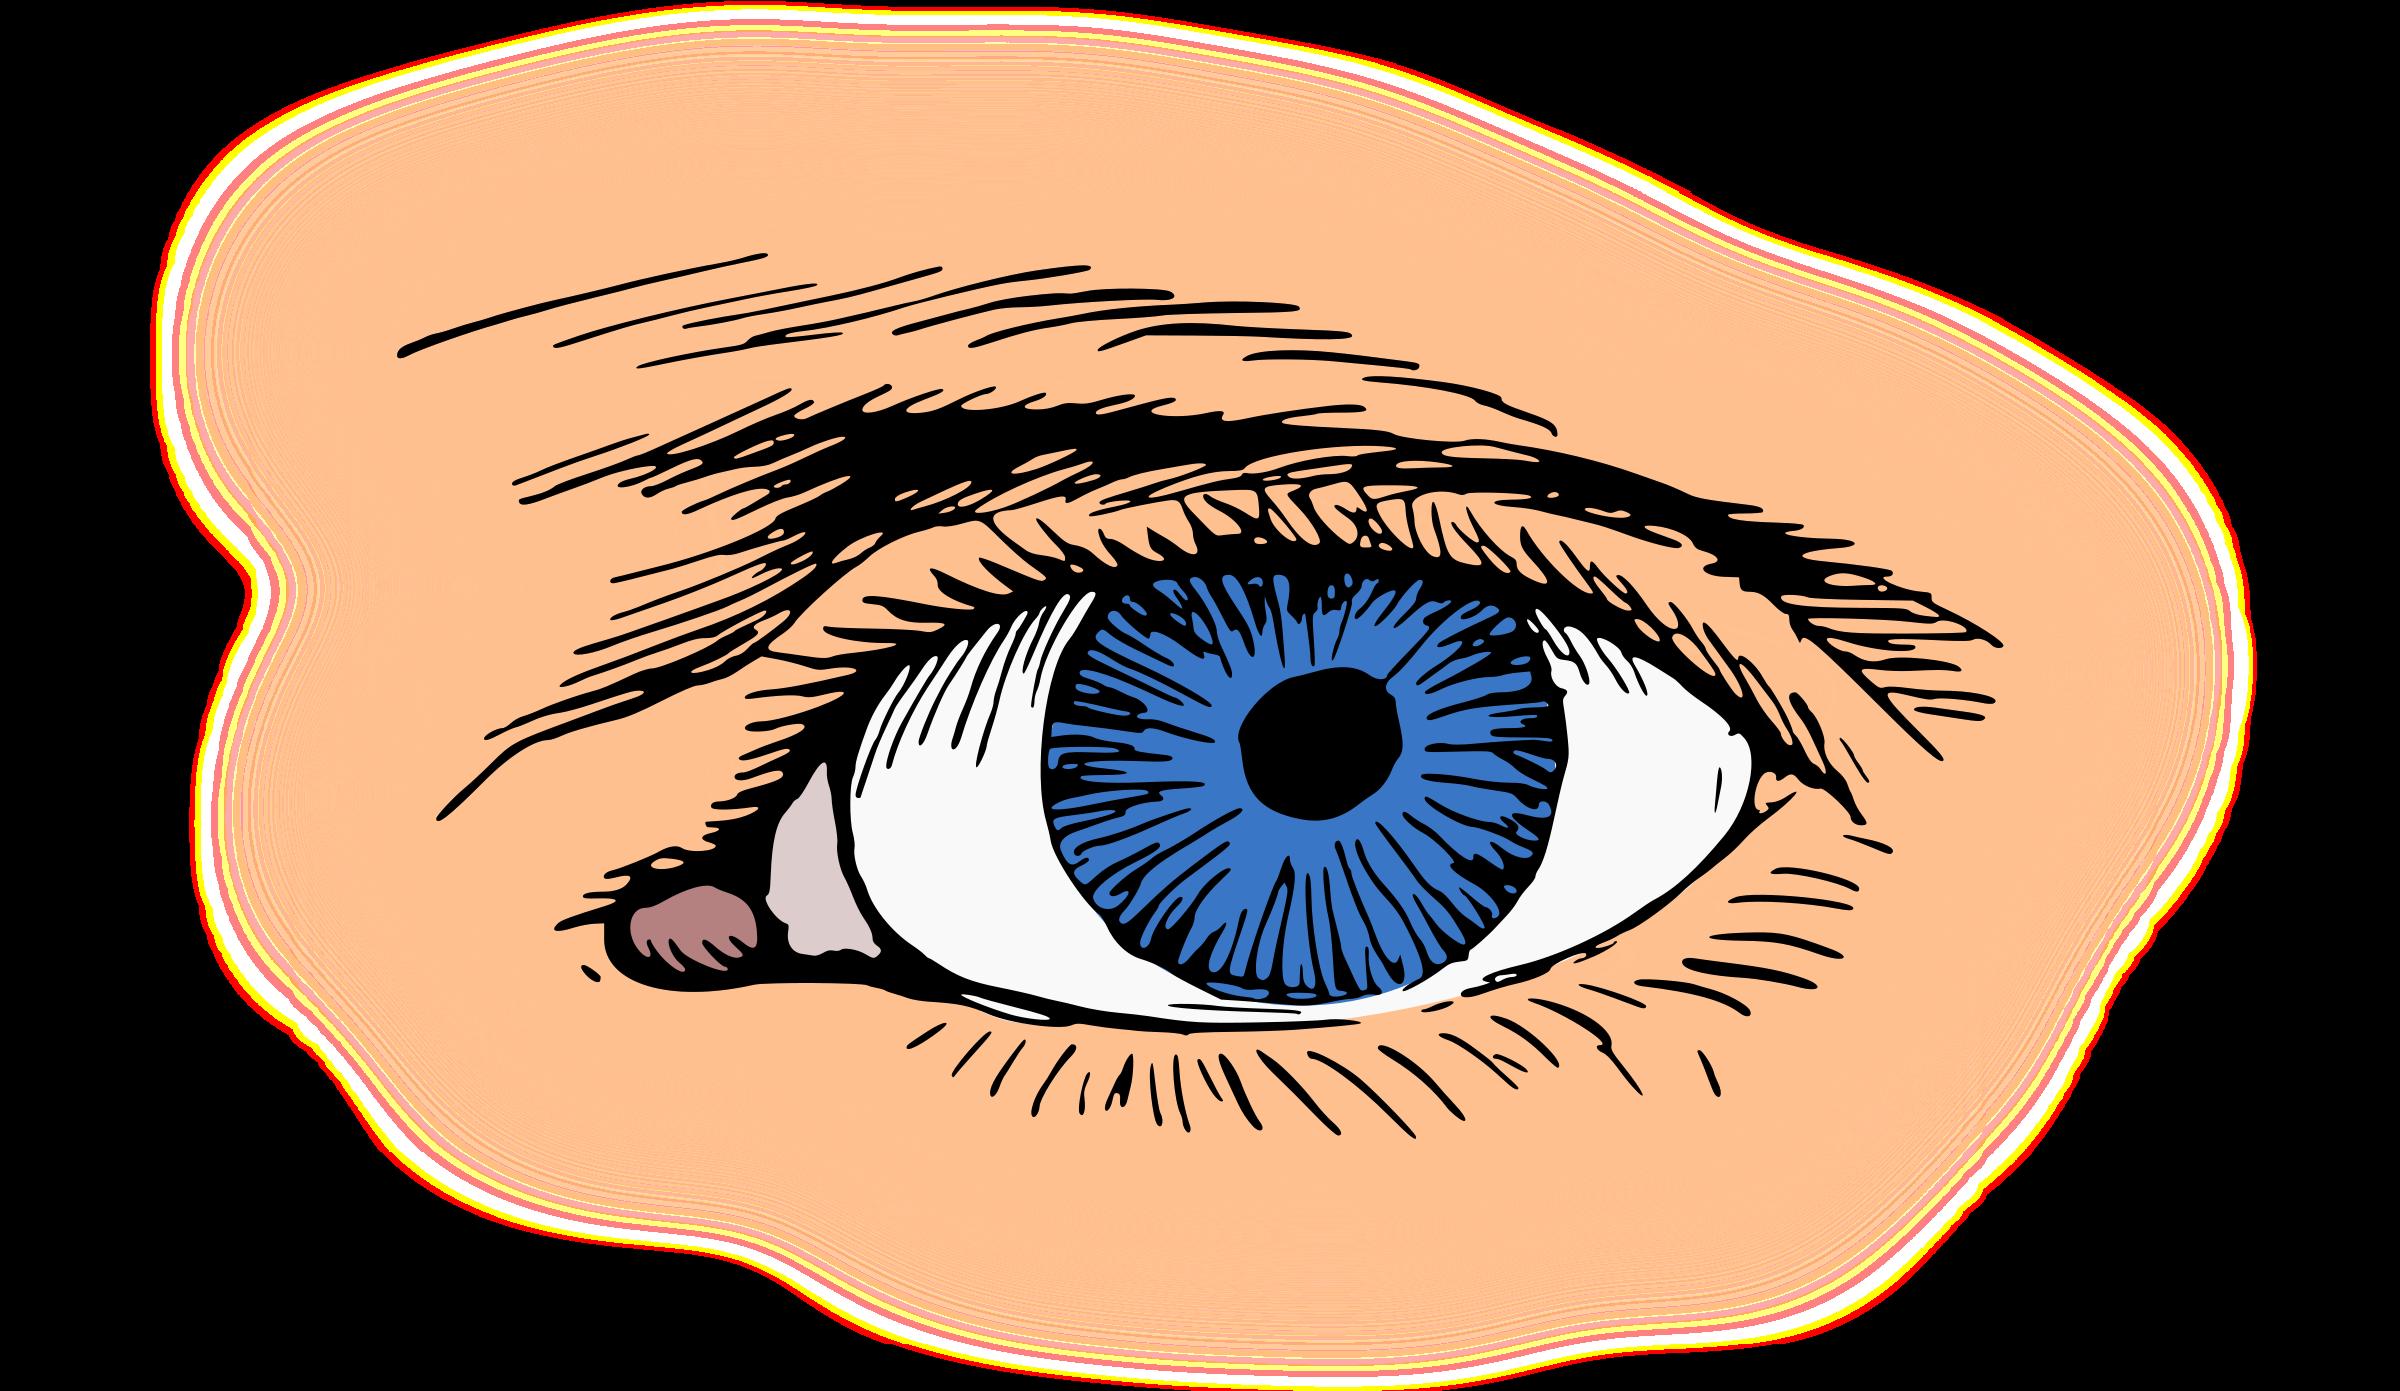 Brown eyes shop of. Eyebrow clipart woman's eye